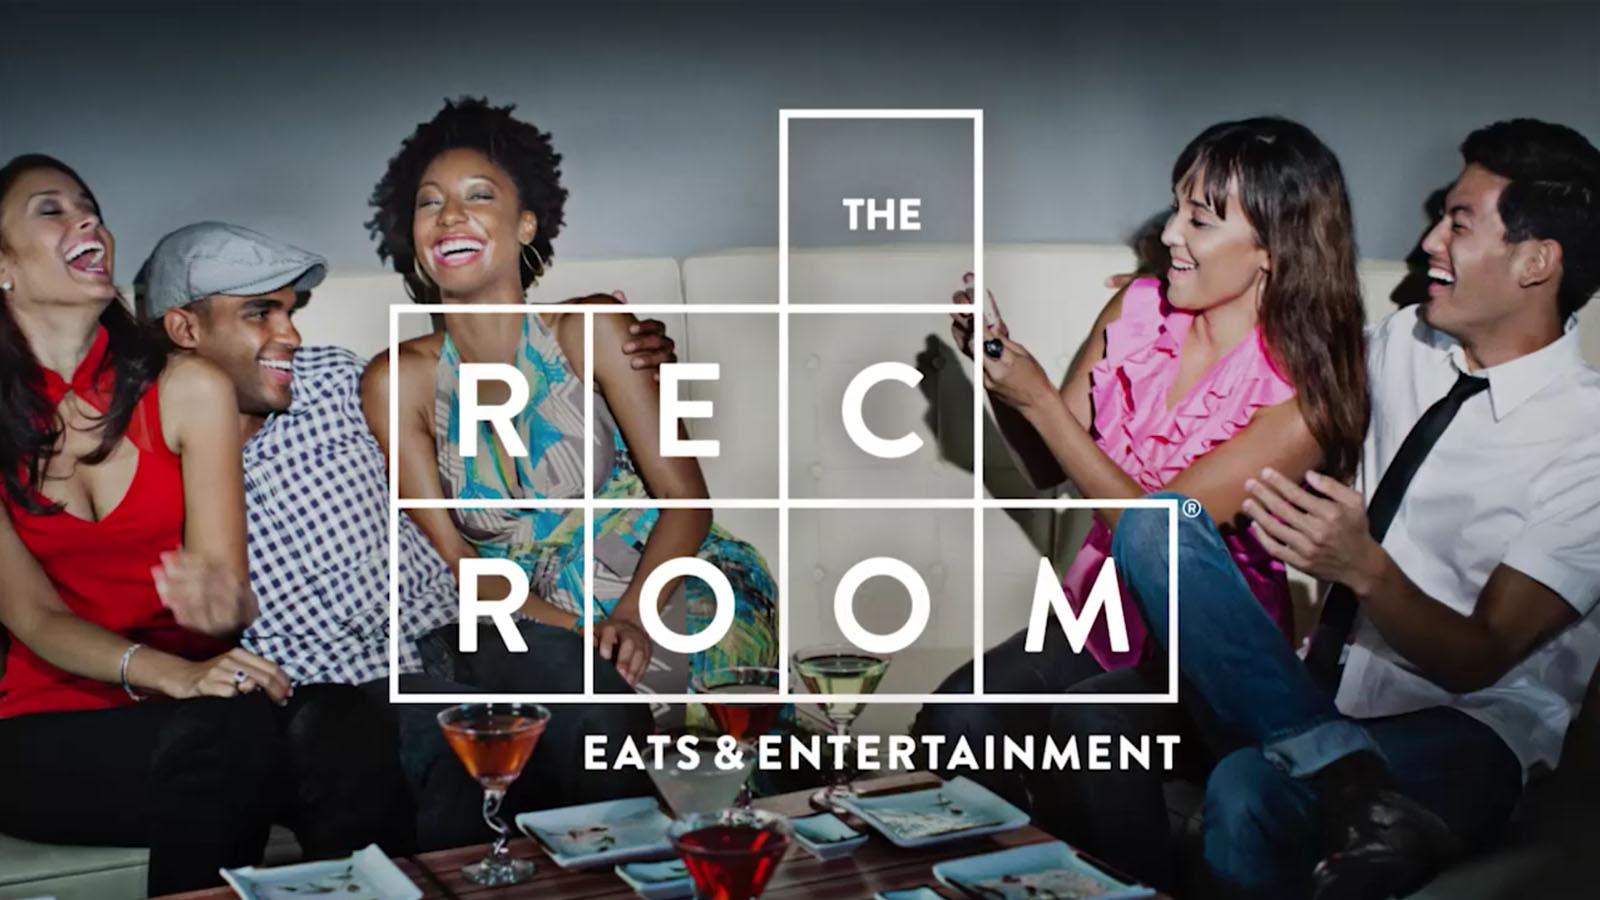 Cineplex Entertainment | The Rec Room | Brand Strategy, Branding